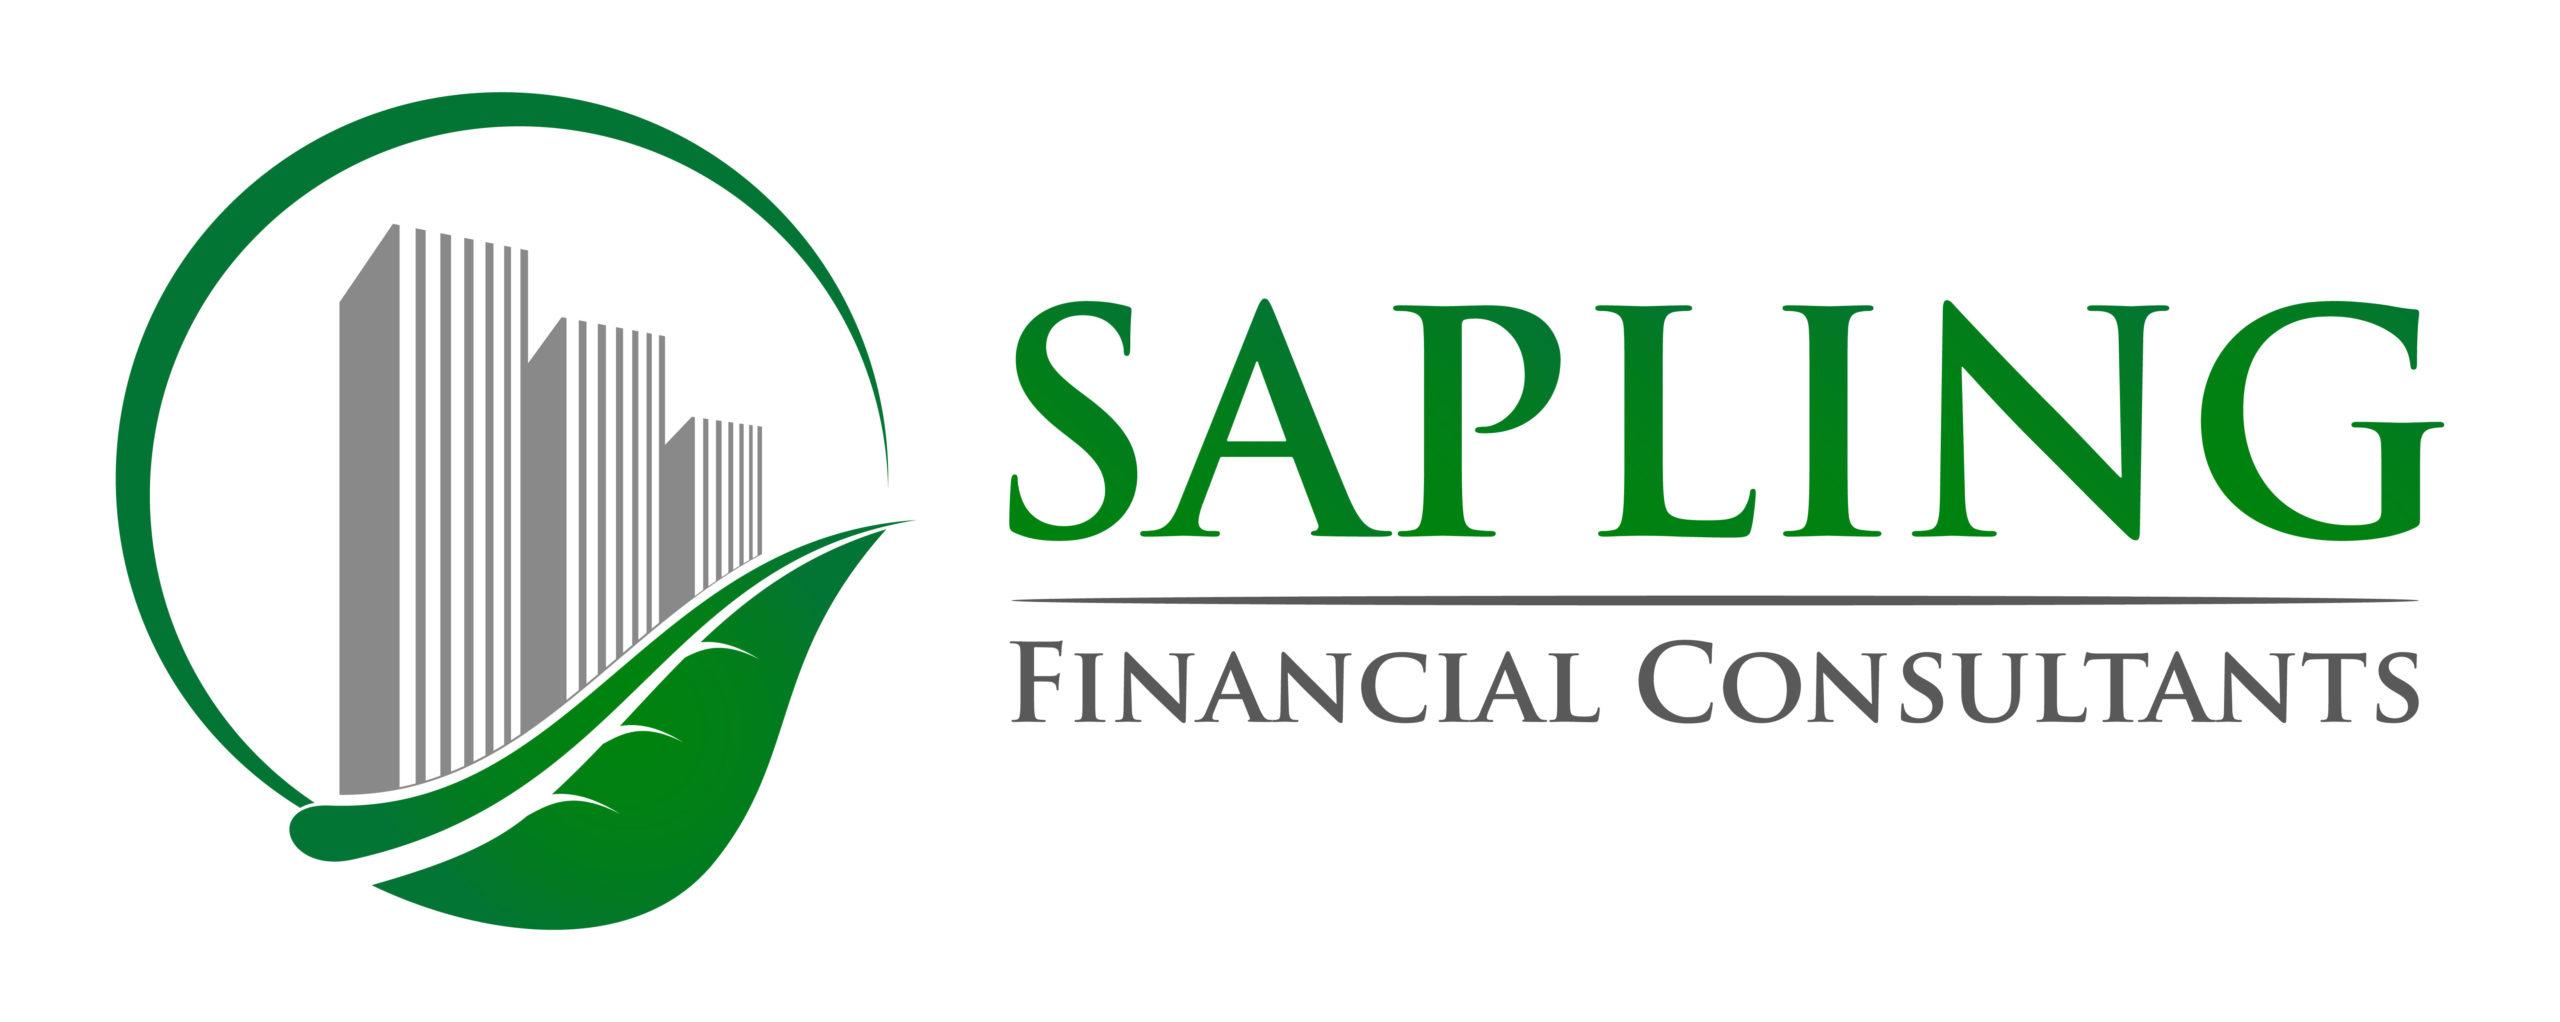 Sapling Financial Consultants Inc.